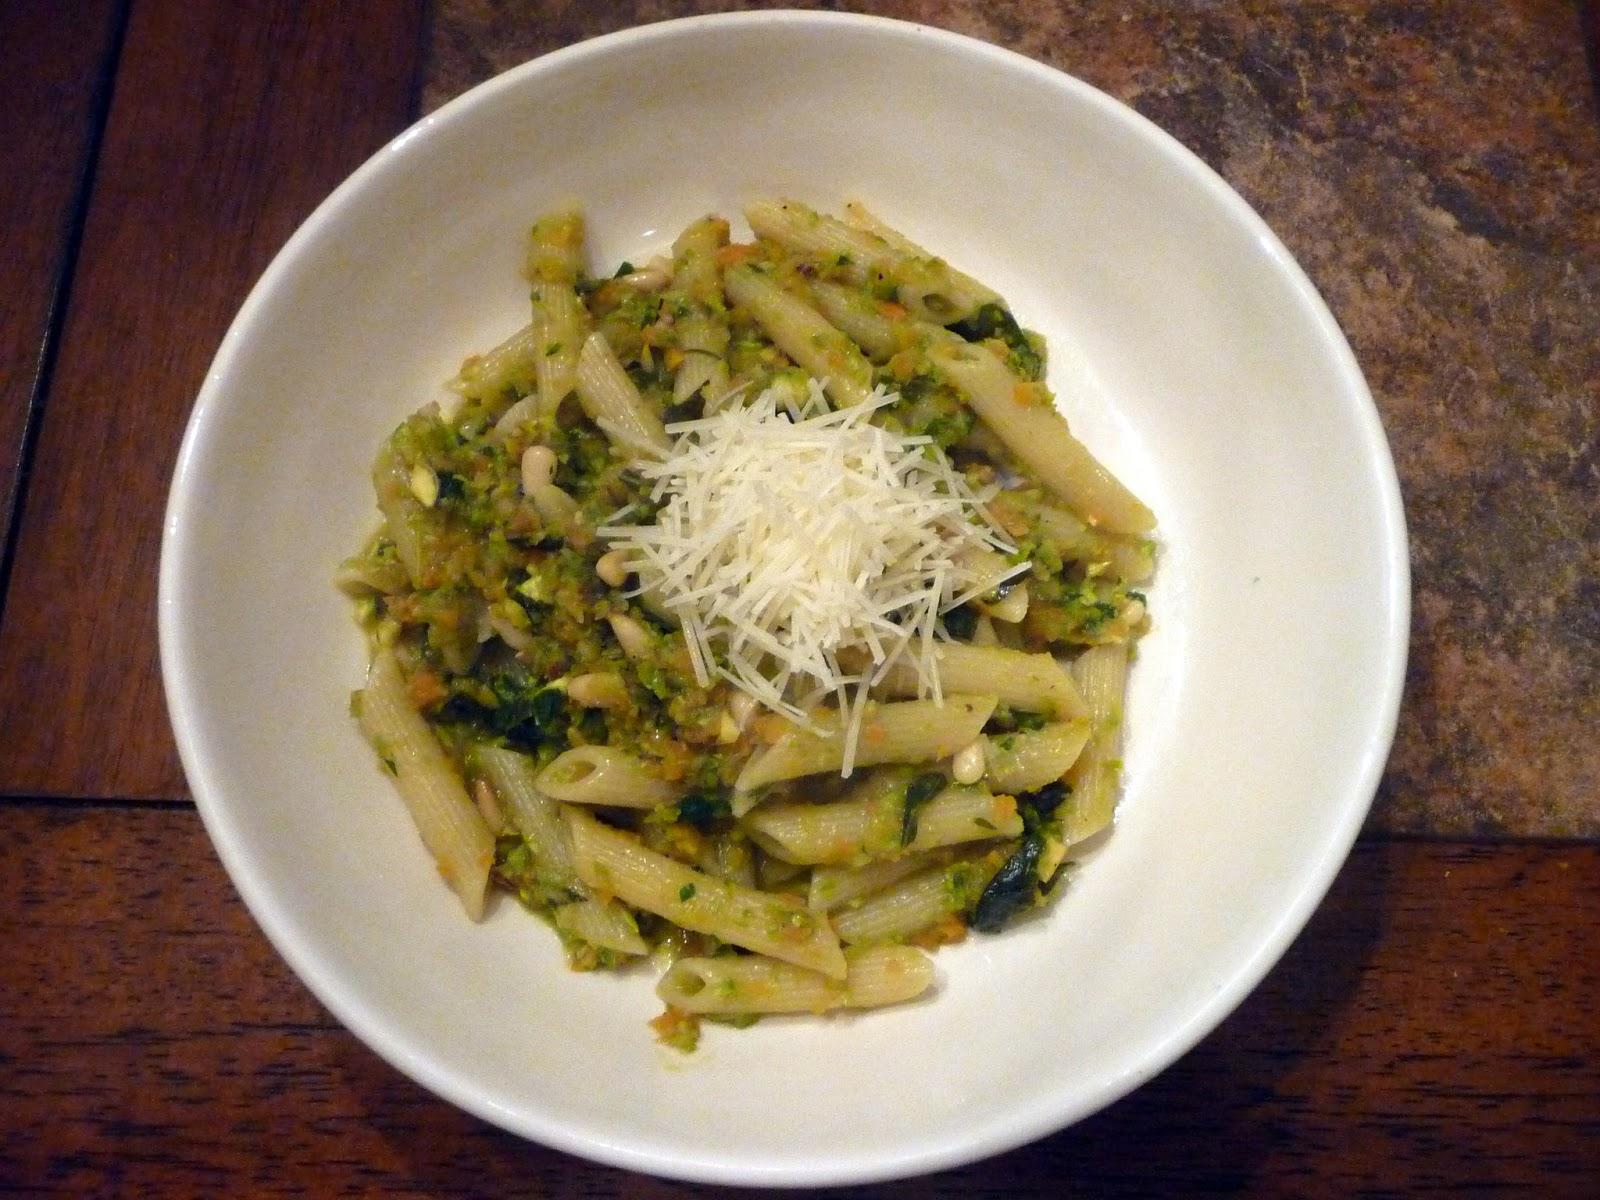 Chef Bolek: Penne Rigate with Asparagus-Pistachio Pesto